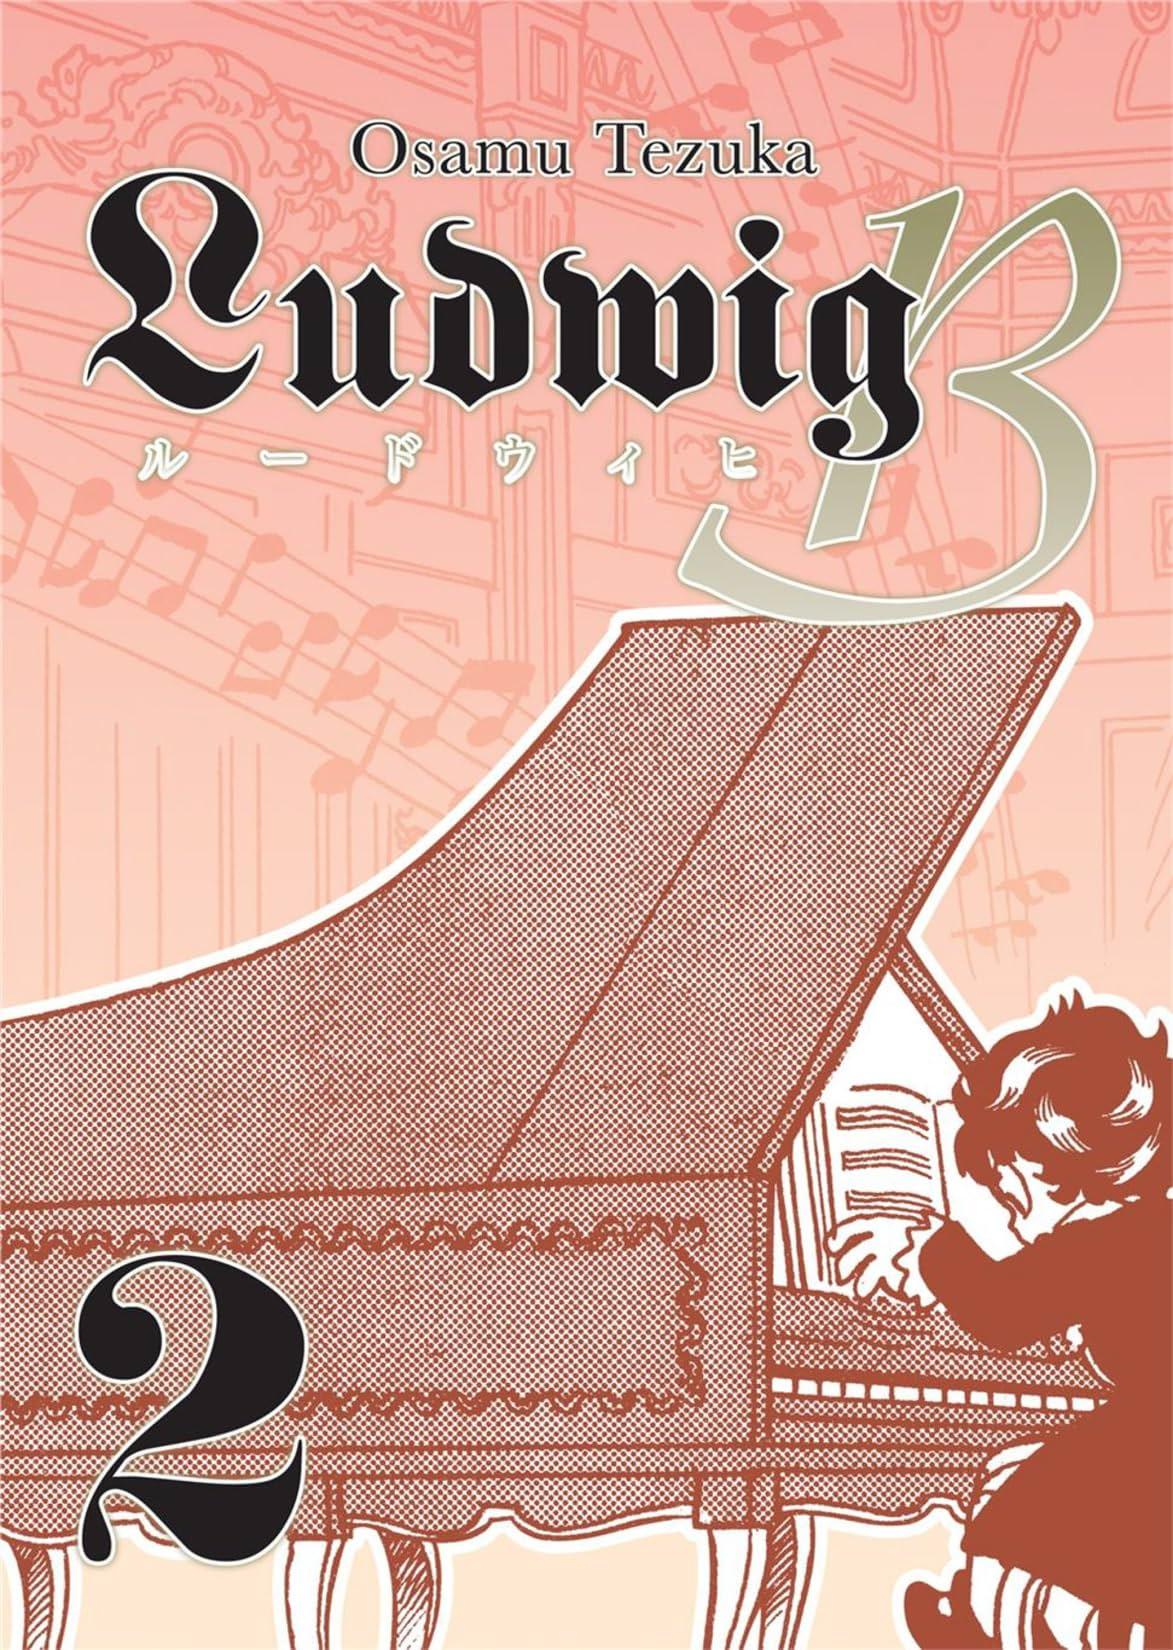 Ludwig B Vol. 2